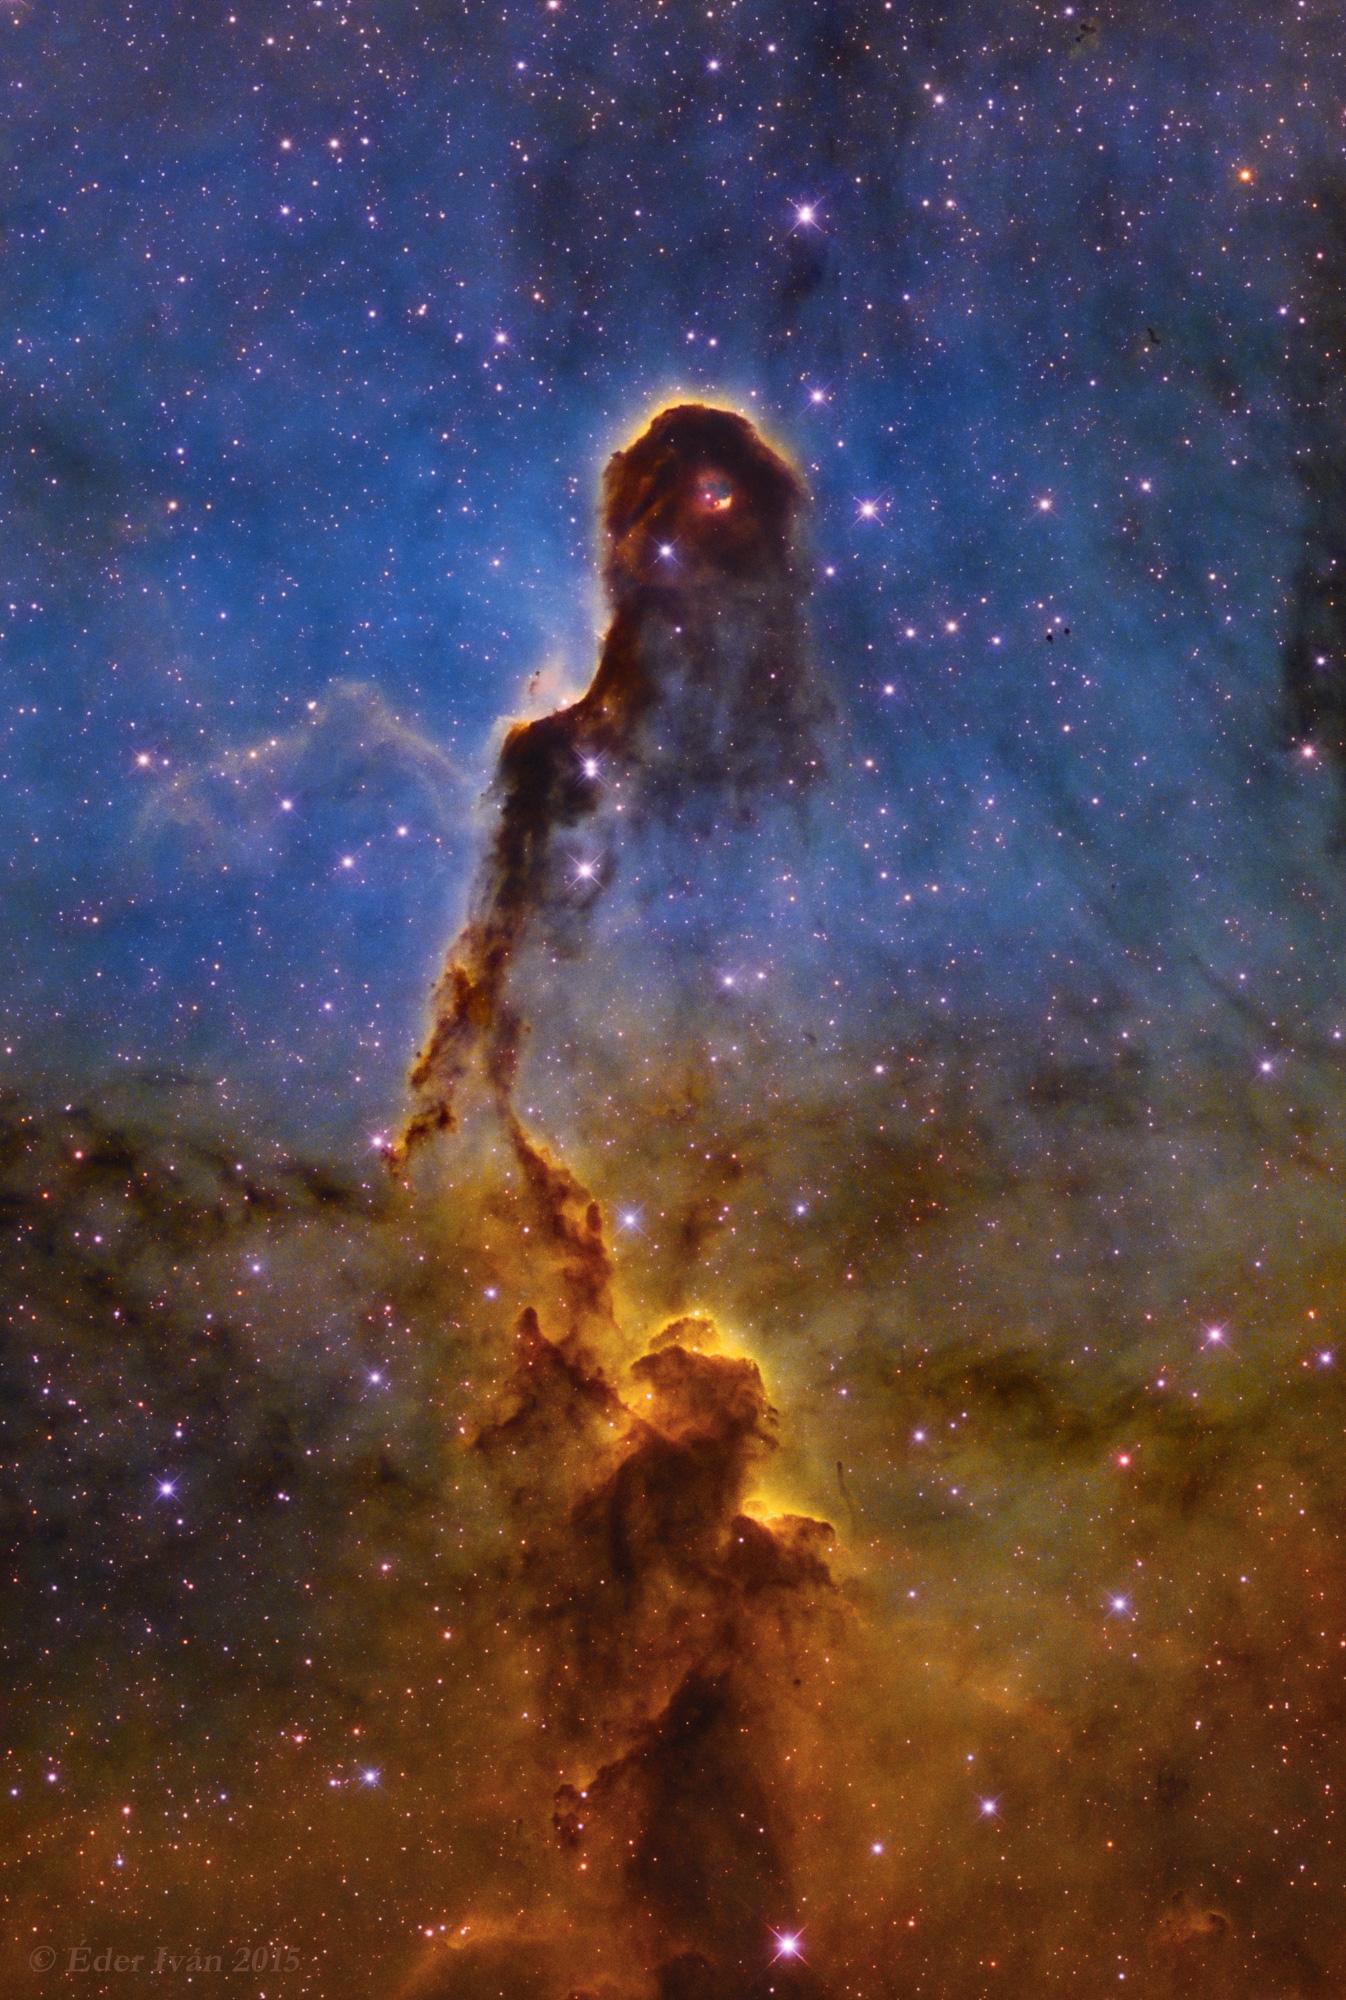 Elephant's Trunk Nebula (IC 1396A)